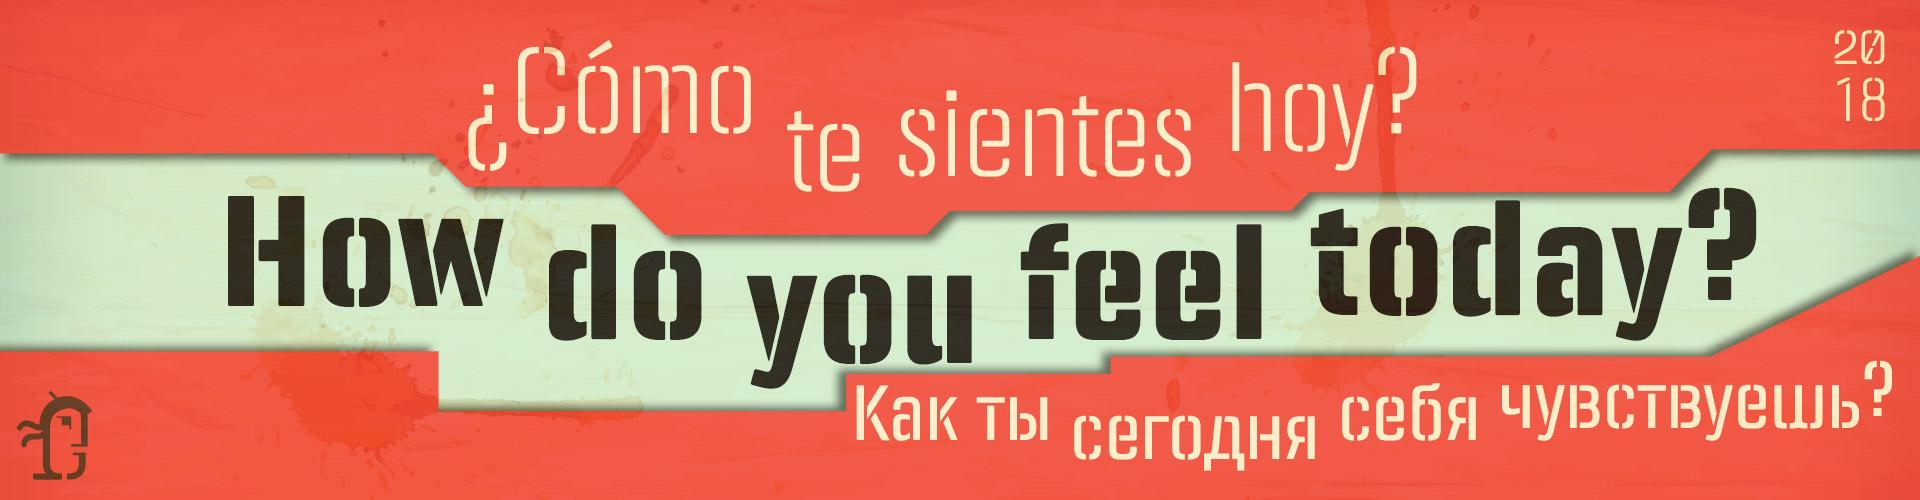 Panfleta Stencil Typefaces- How do you feel today?